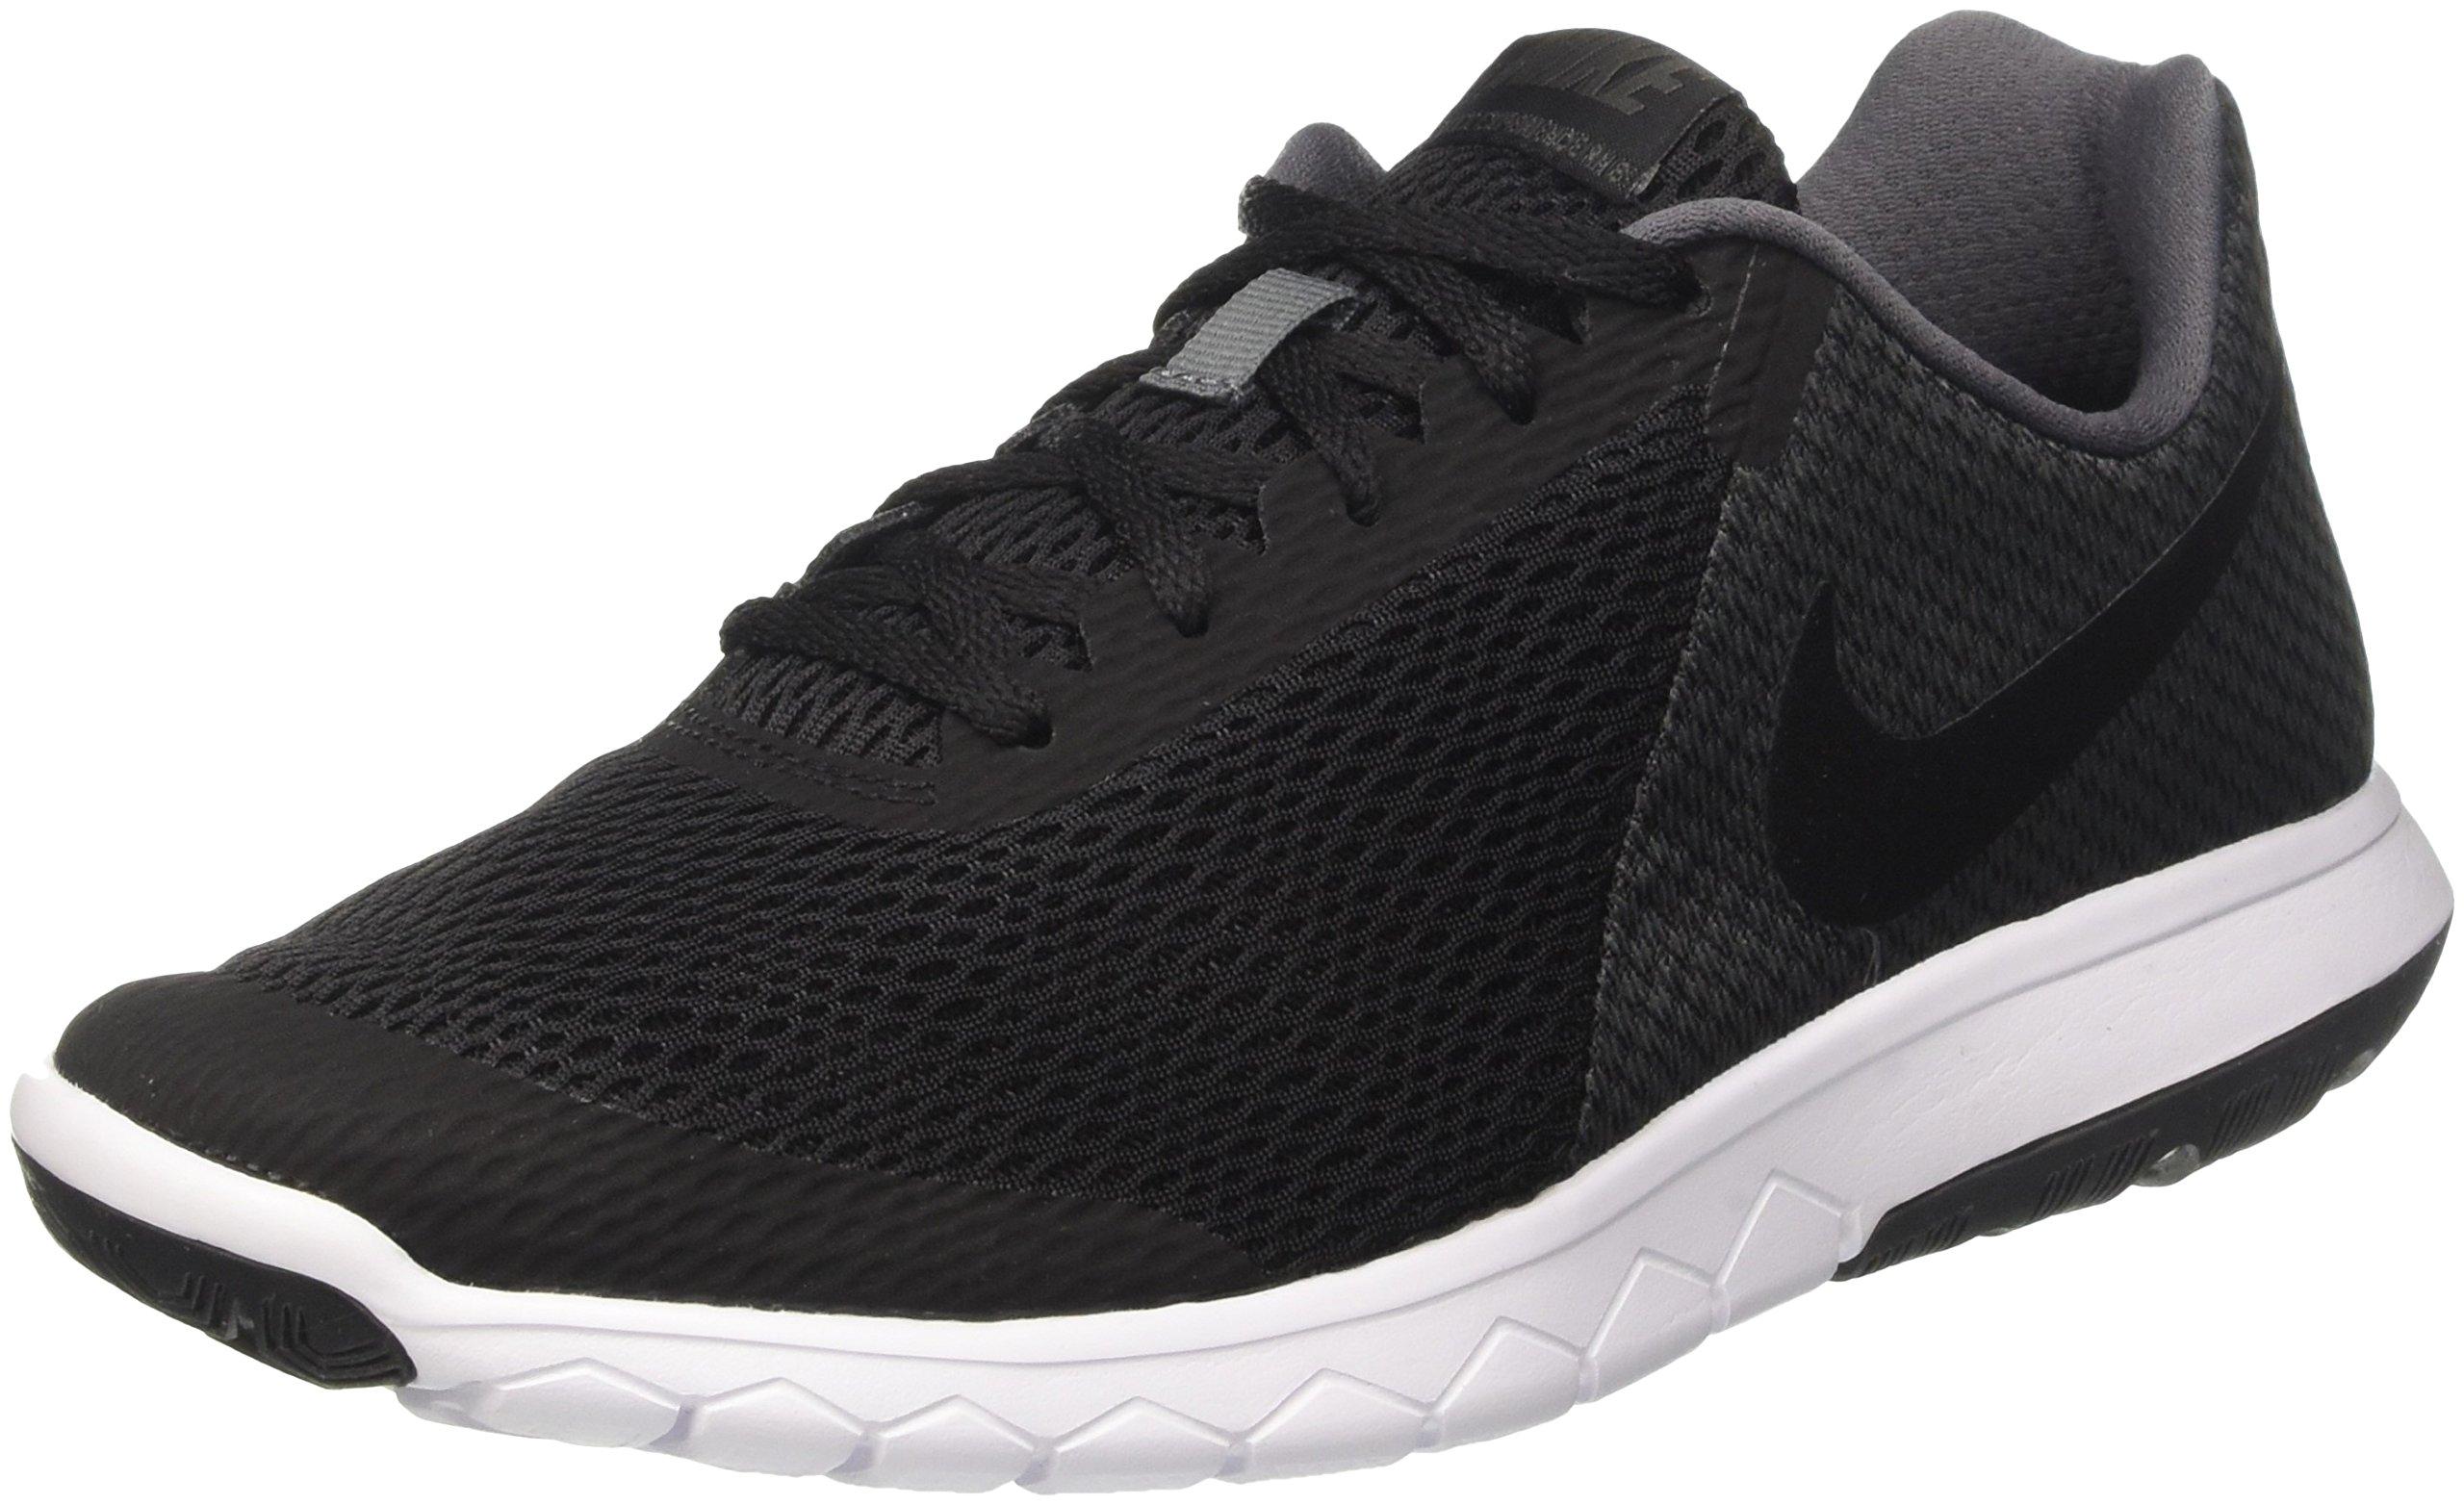 a8e4d8bf610d4 Nike Men's Flex Experience Run 6 Running Shoes Black 7